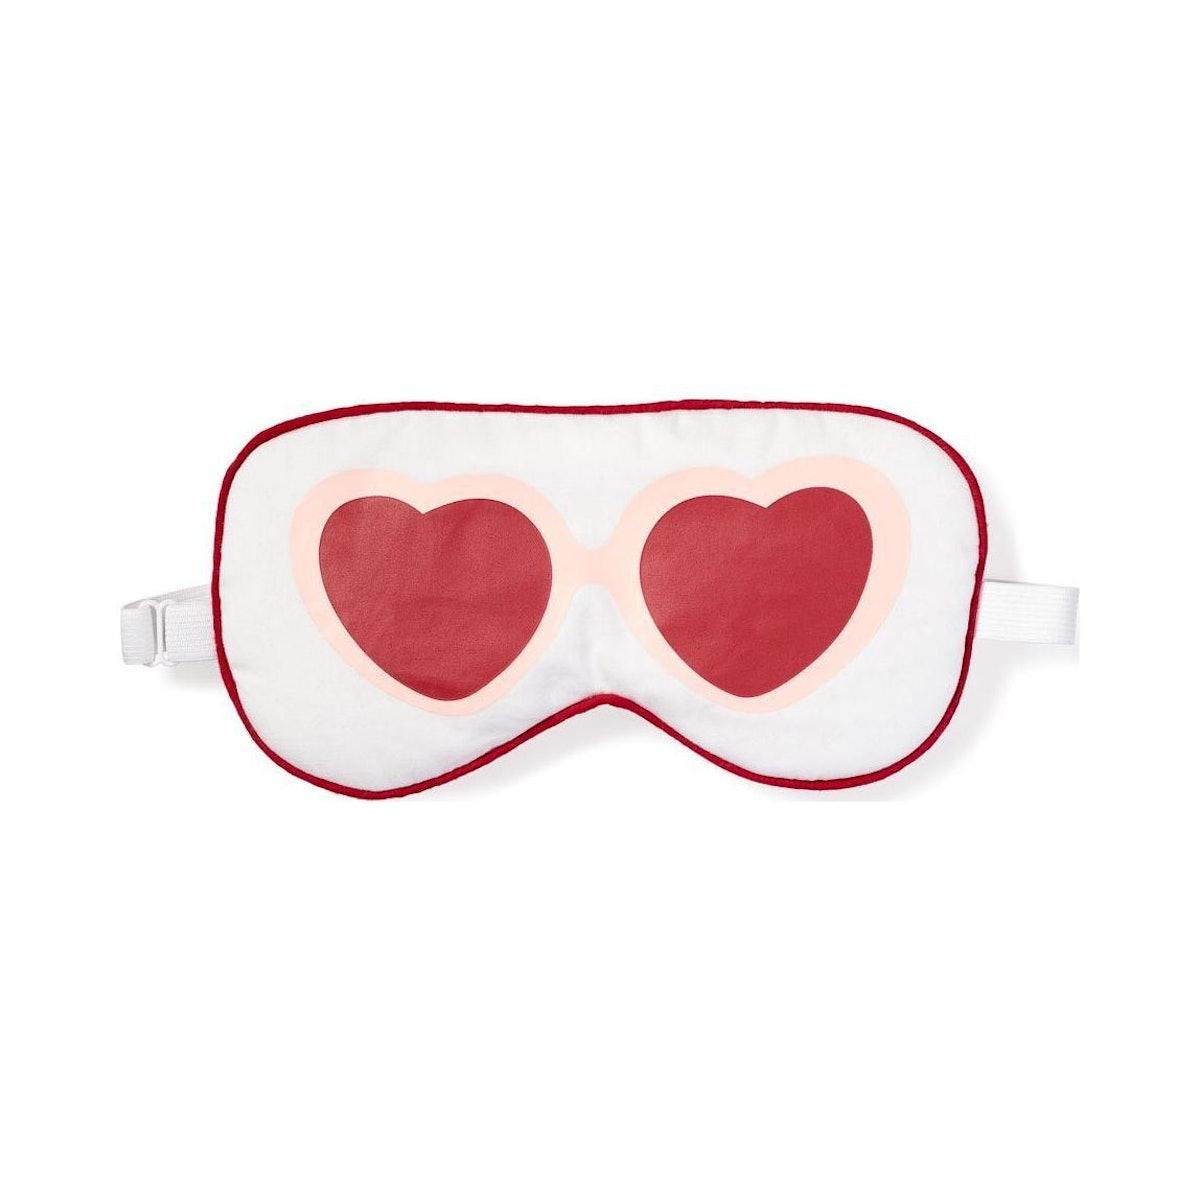 Petite Plume Adult Heart-Shaped Sunnies Eye Mask